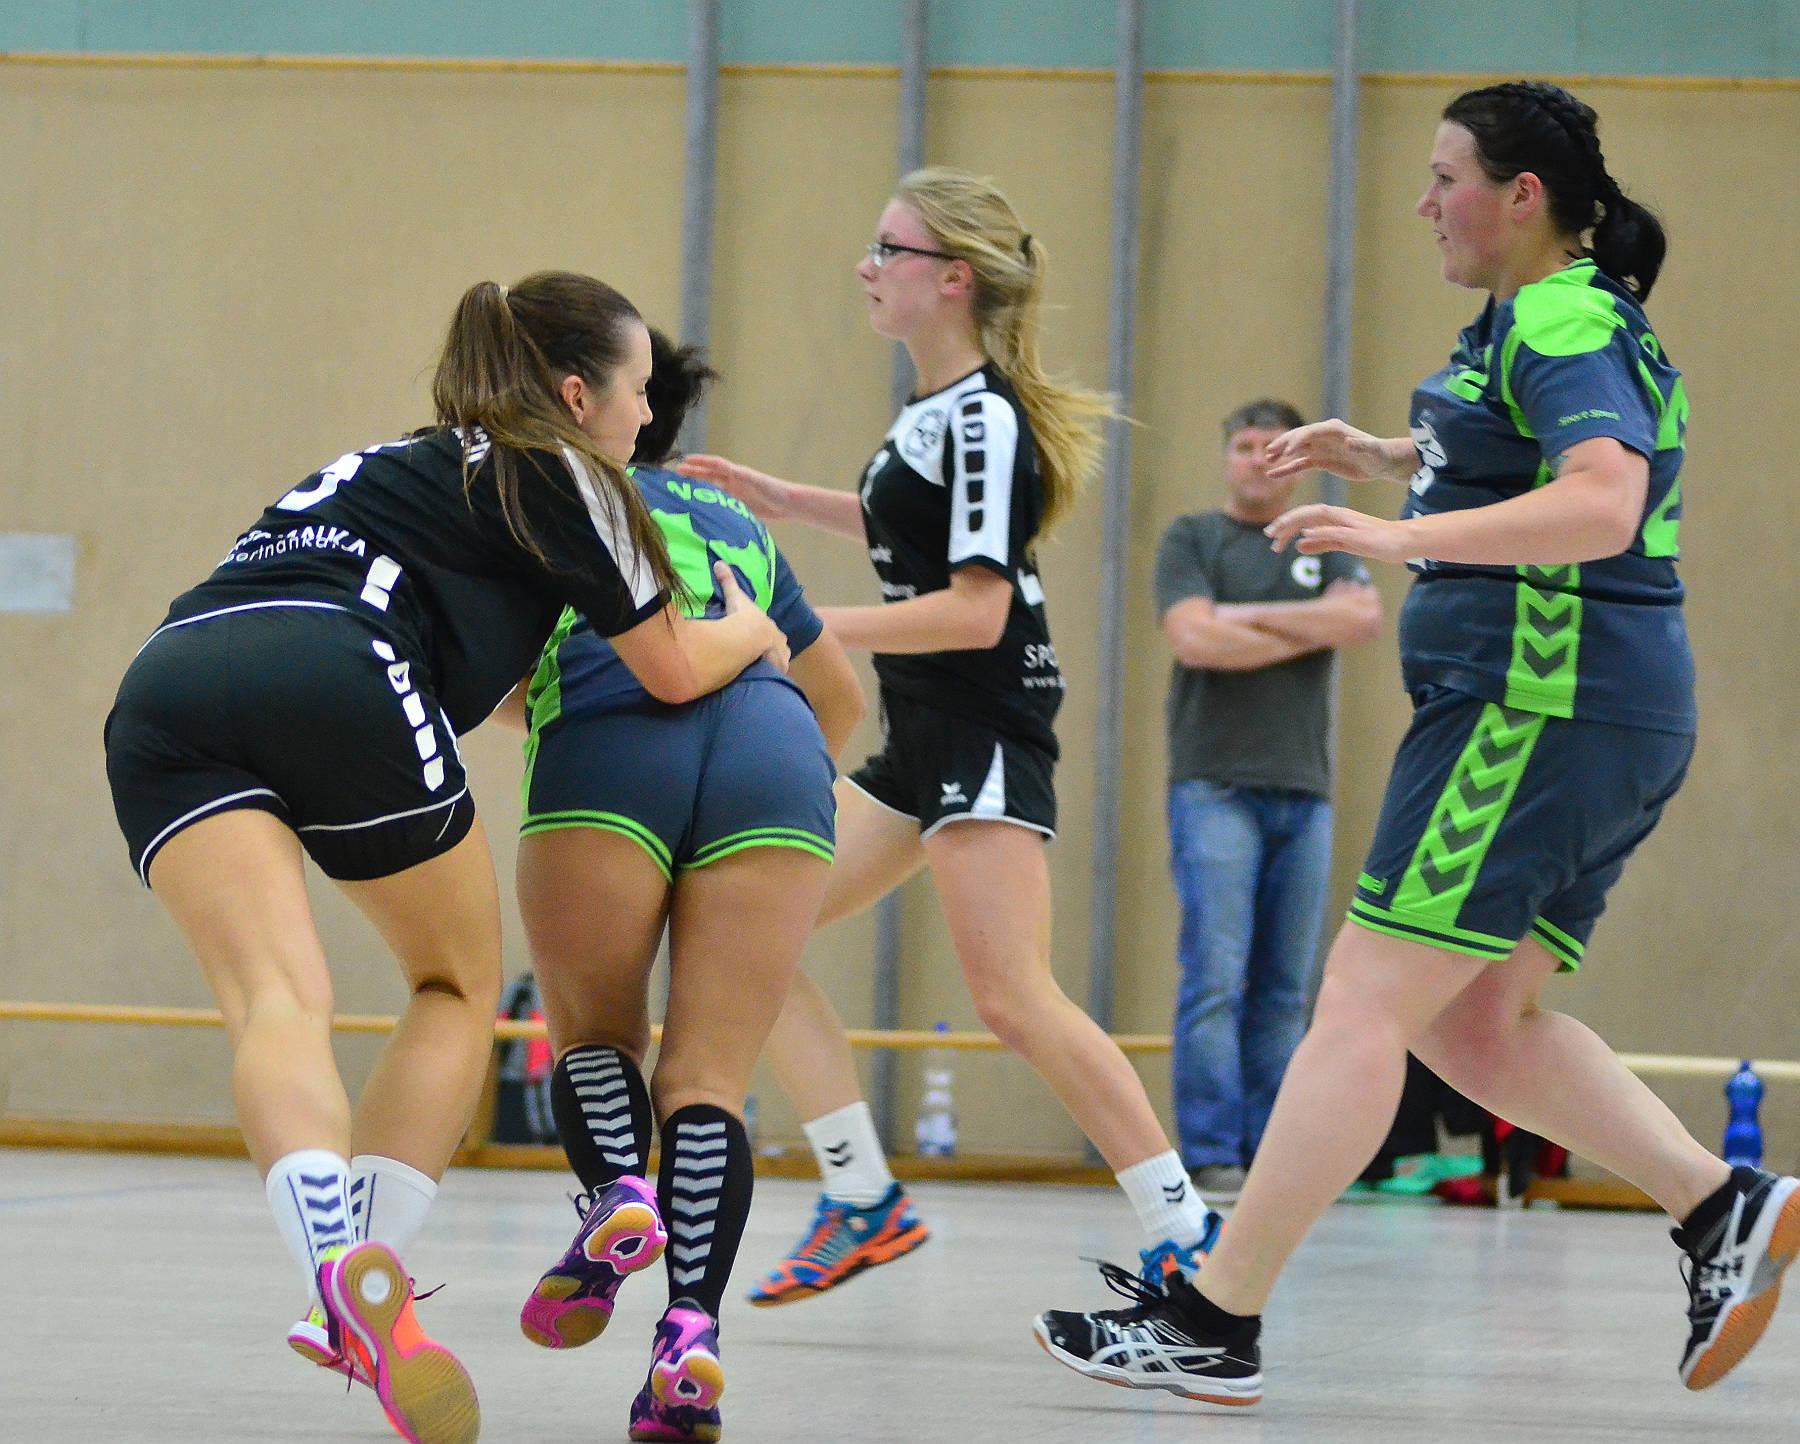 handball sulzbach